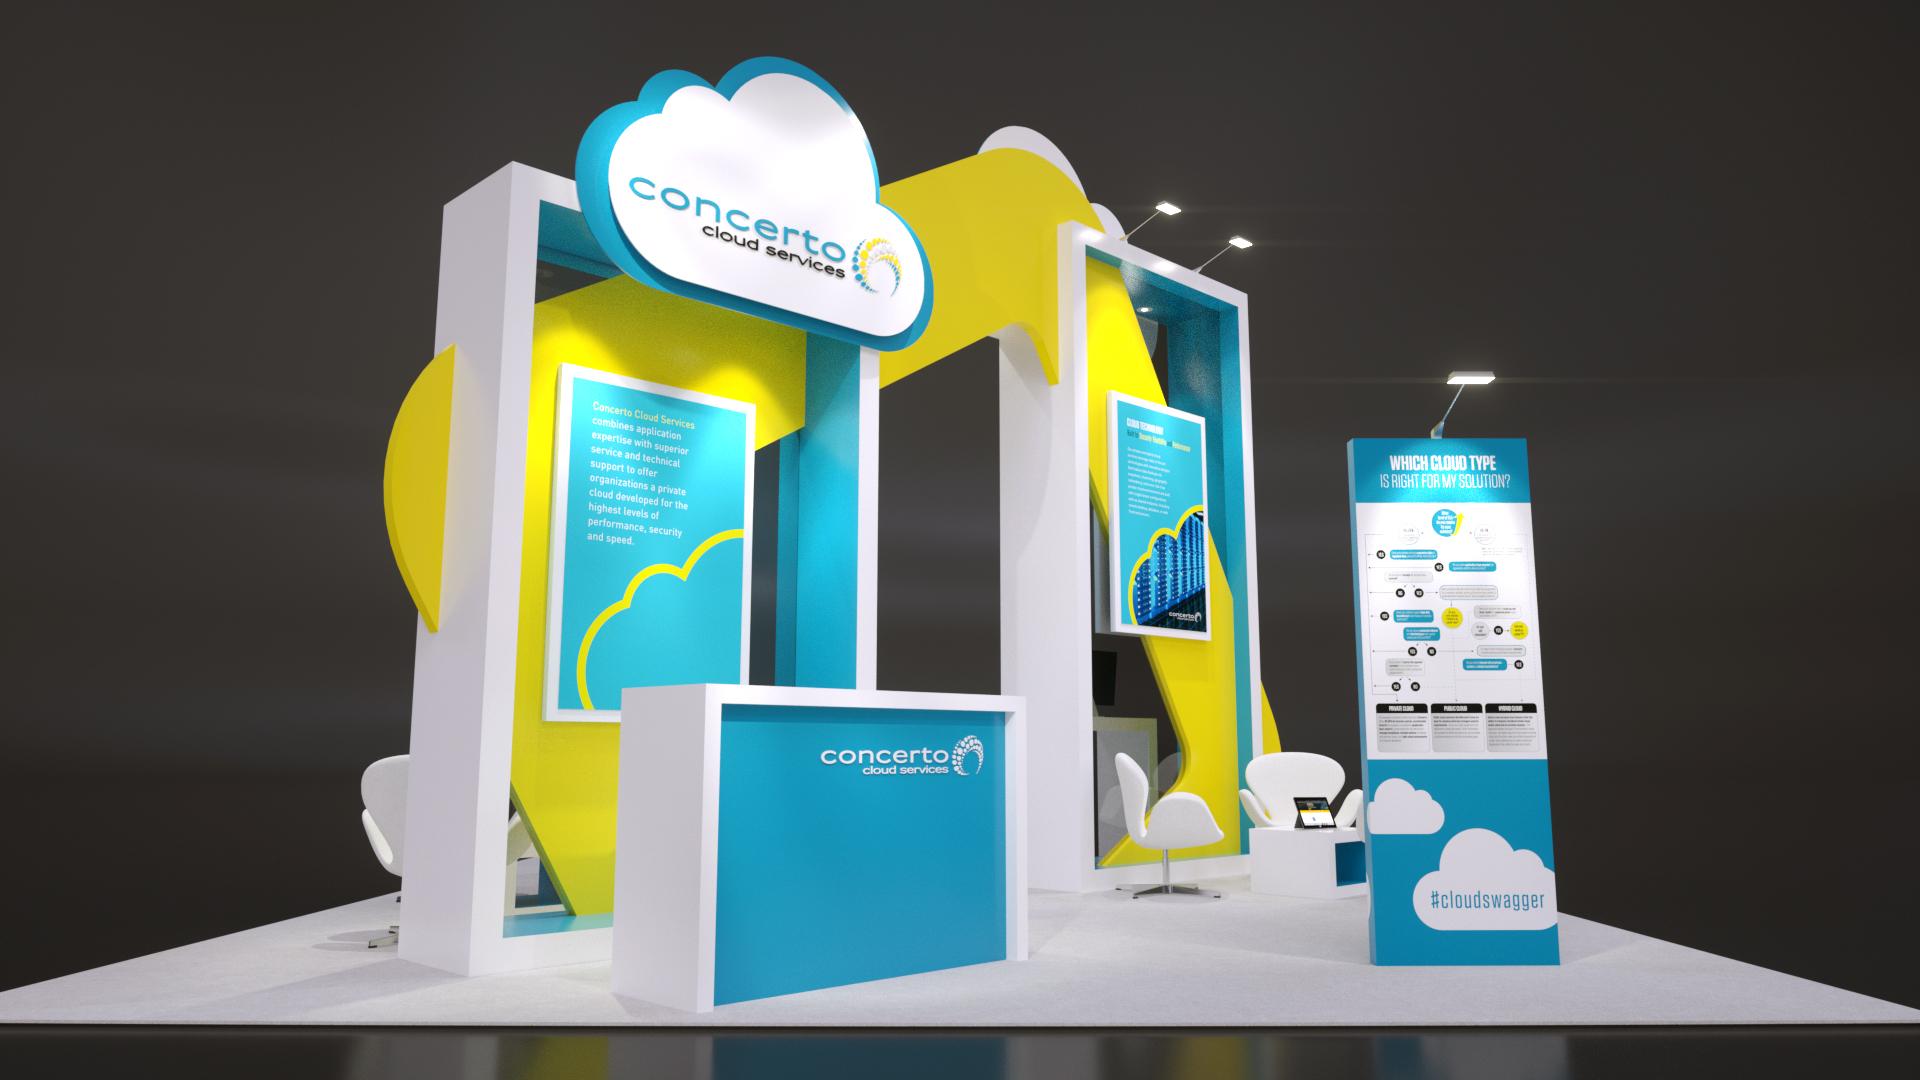 3053 - Concerto Cloud Services - Microsoft Envision 2016 - View 6.jpg